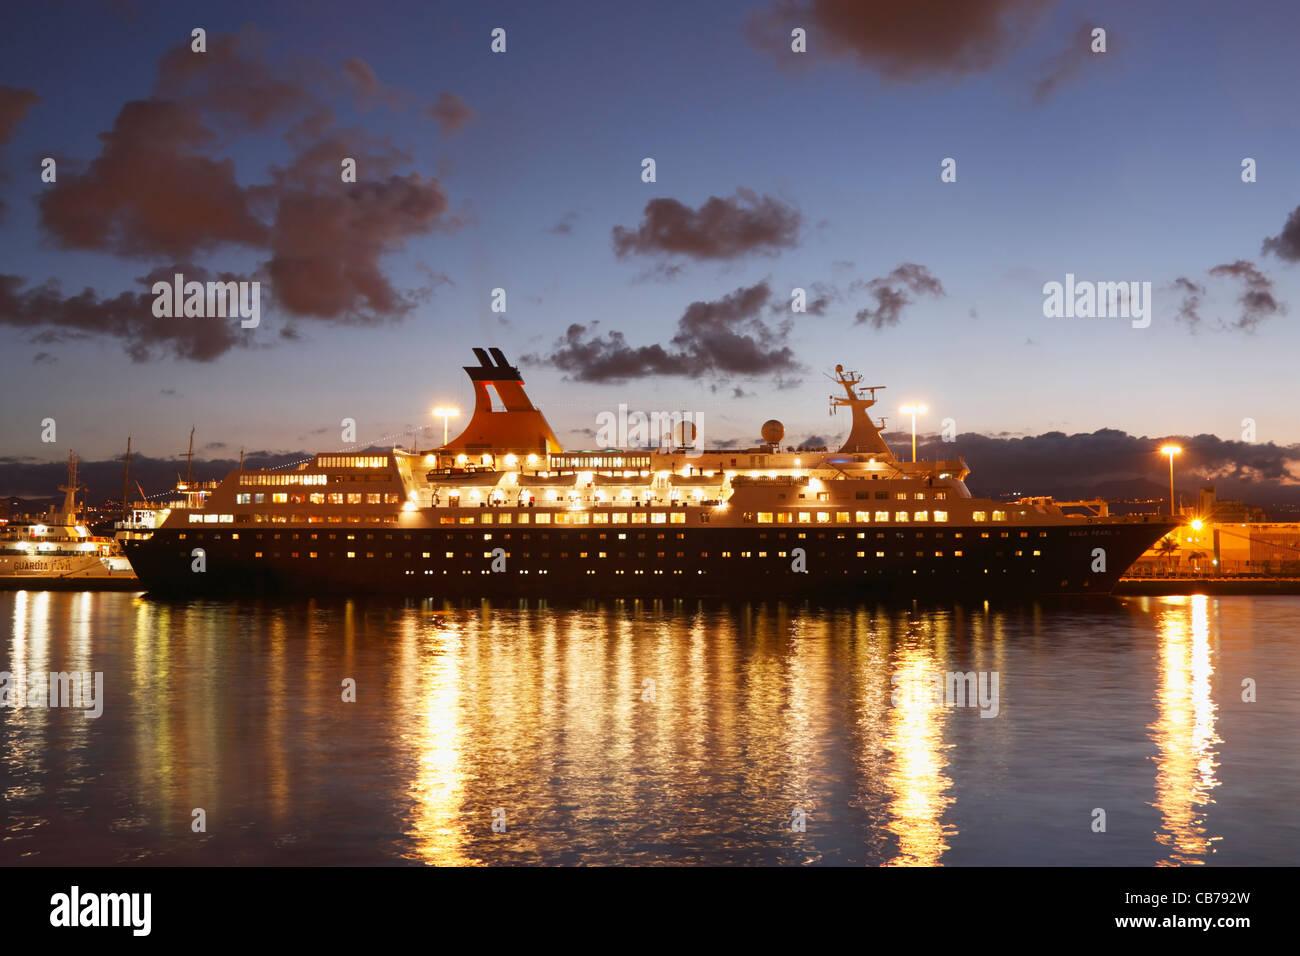 Saga Pearl 11 cruise ship in Las Palmas, Gran Canaria, Canary Islands, Spain - Stock Image